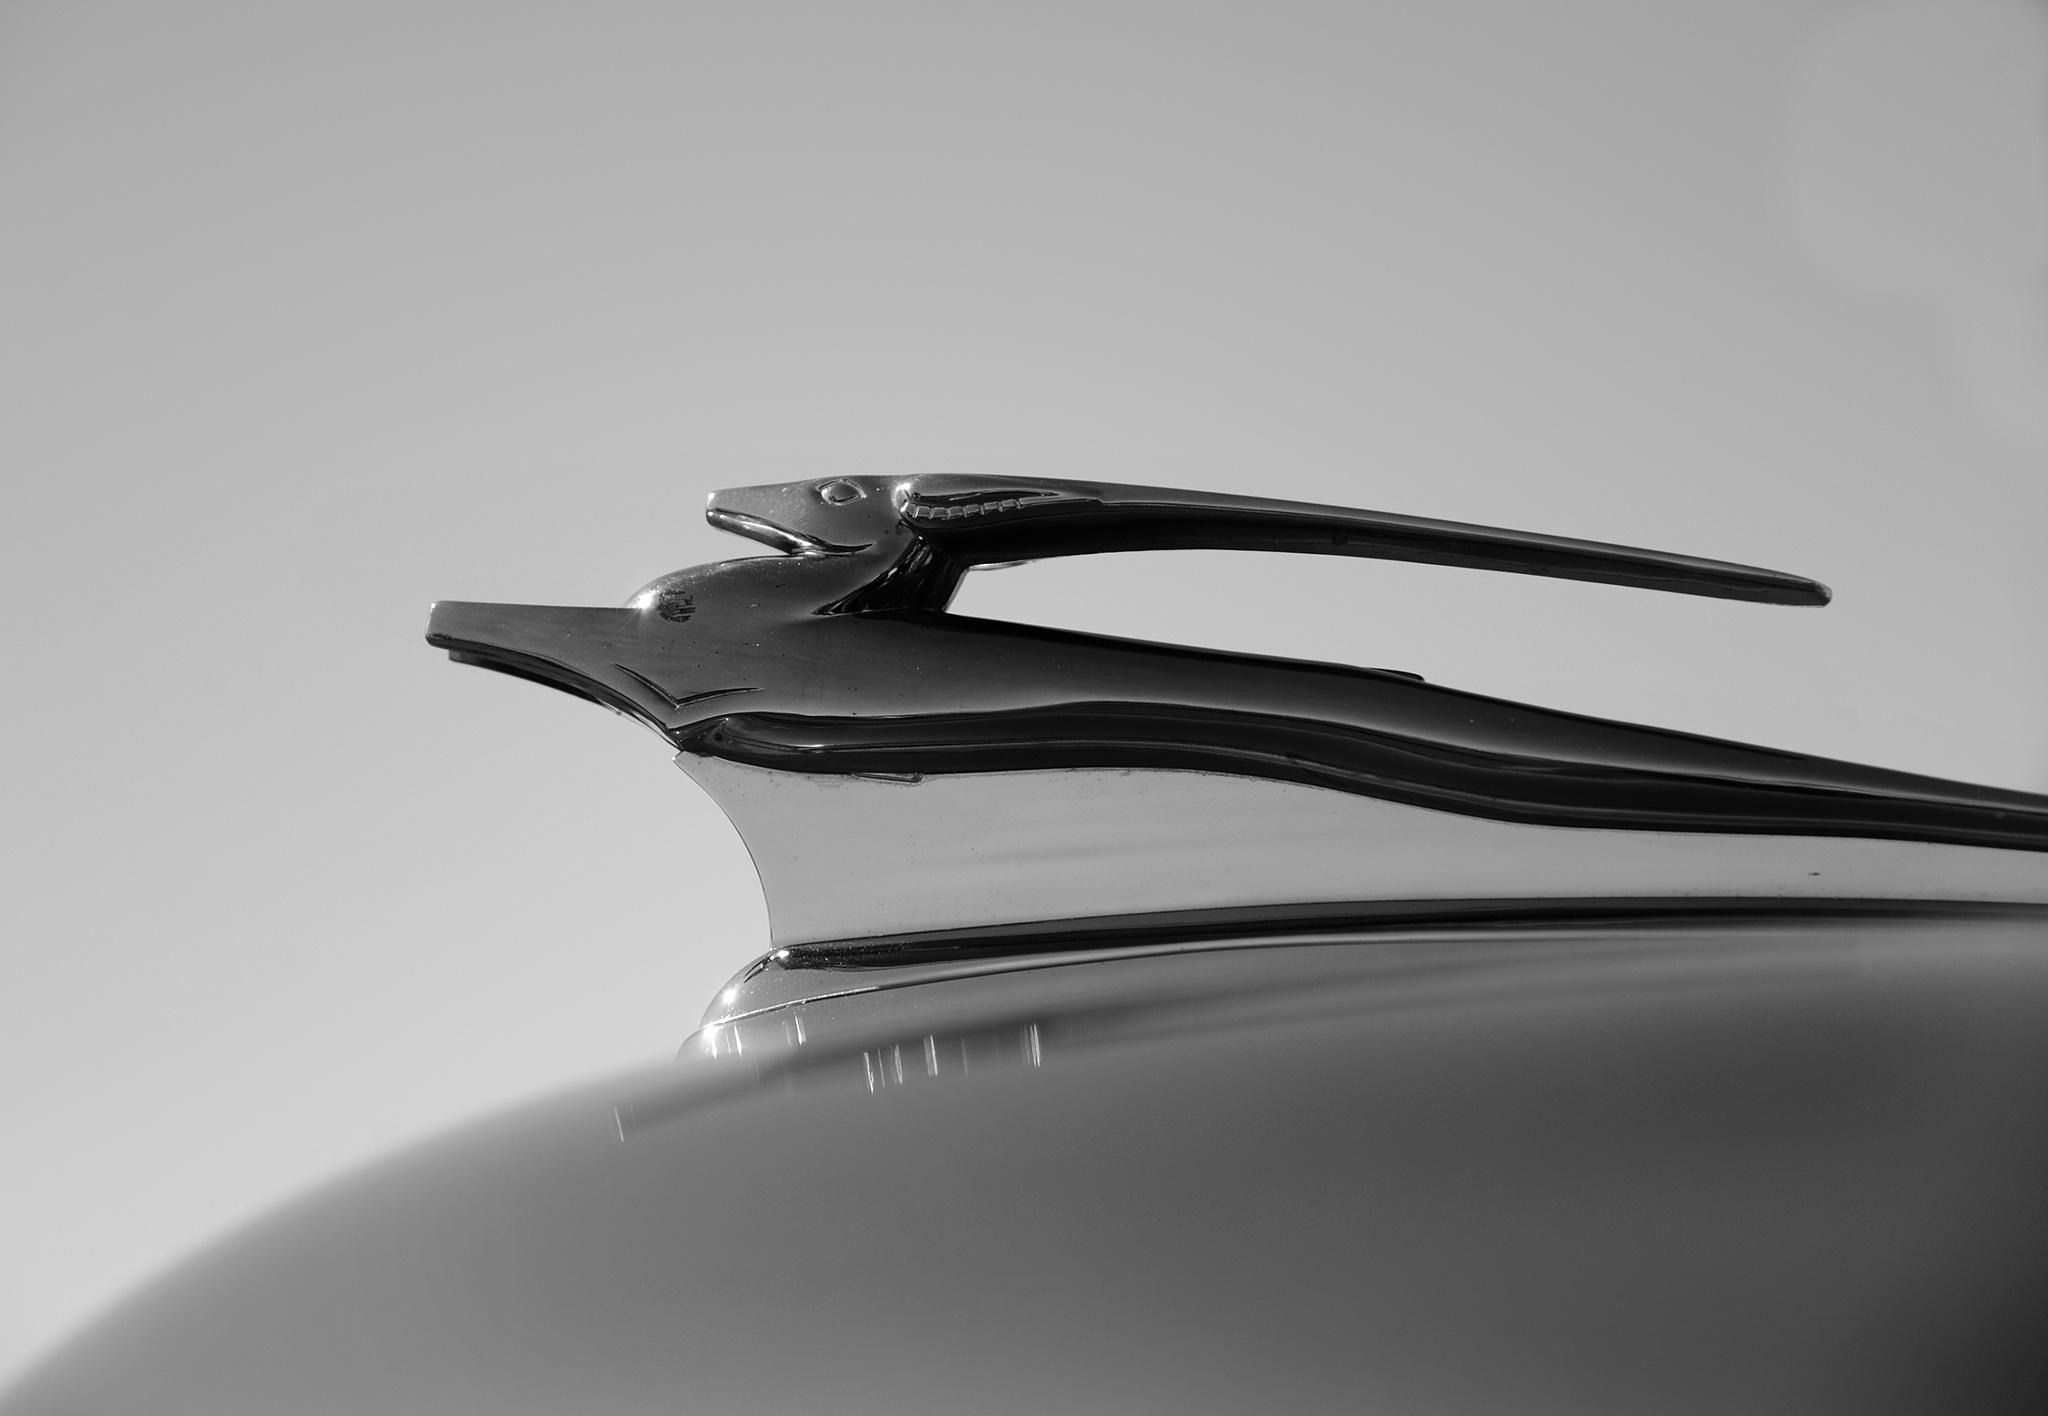 1951 Chevrolet by gmark13